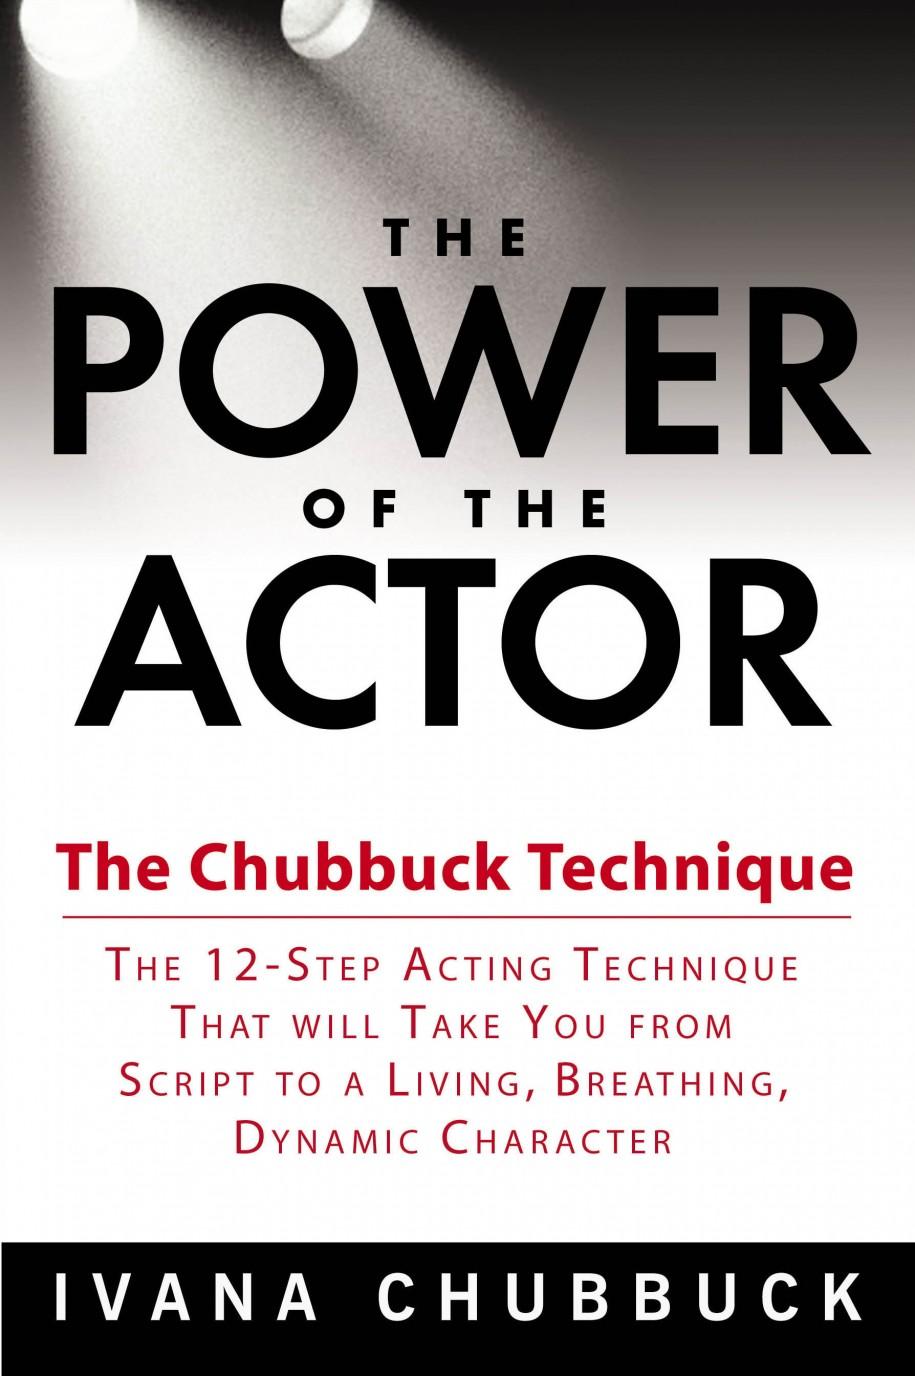 the book Ivana Chubukk